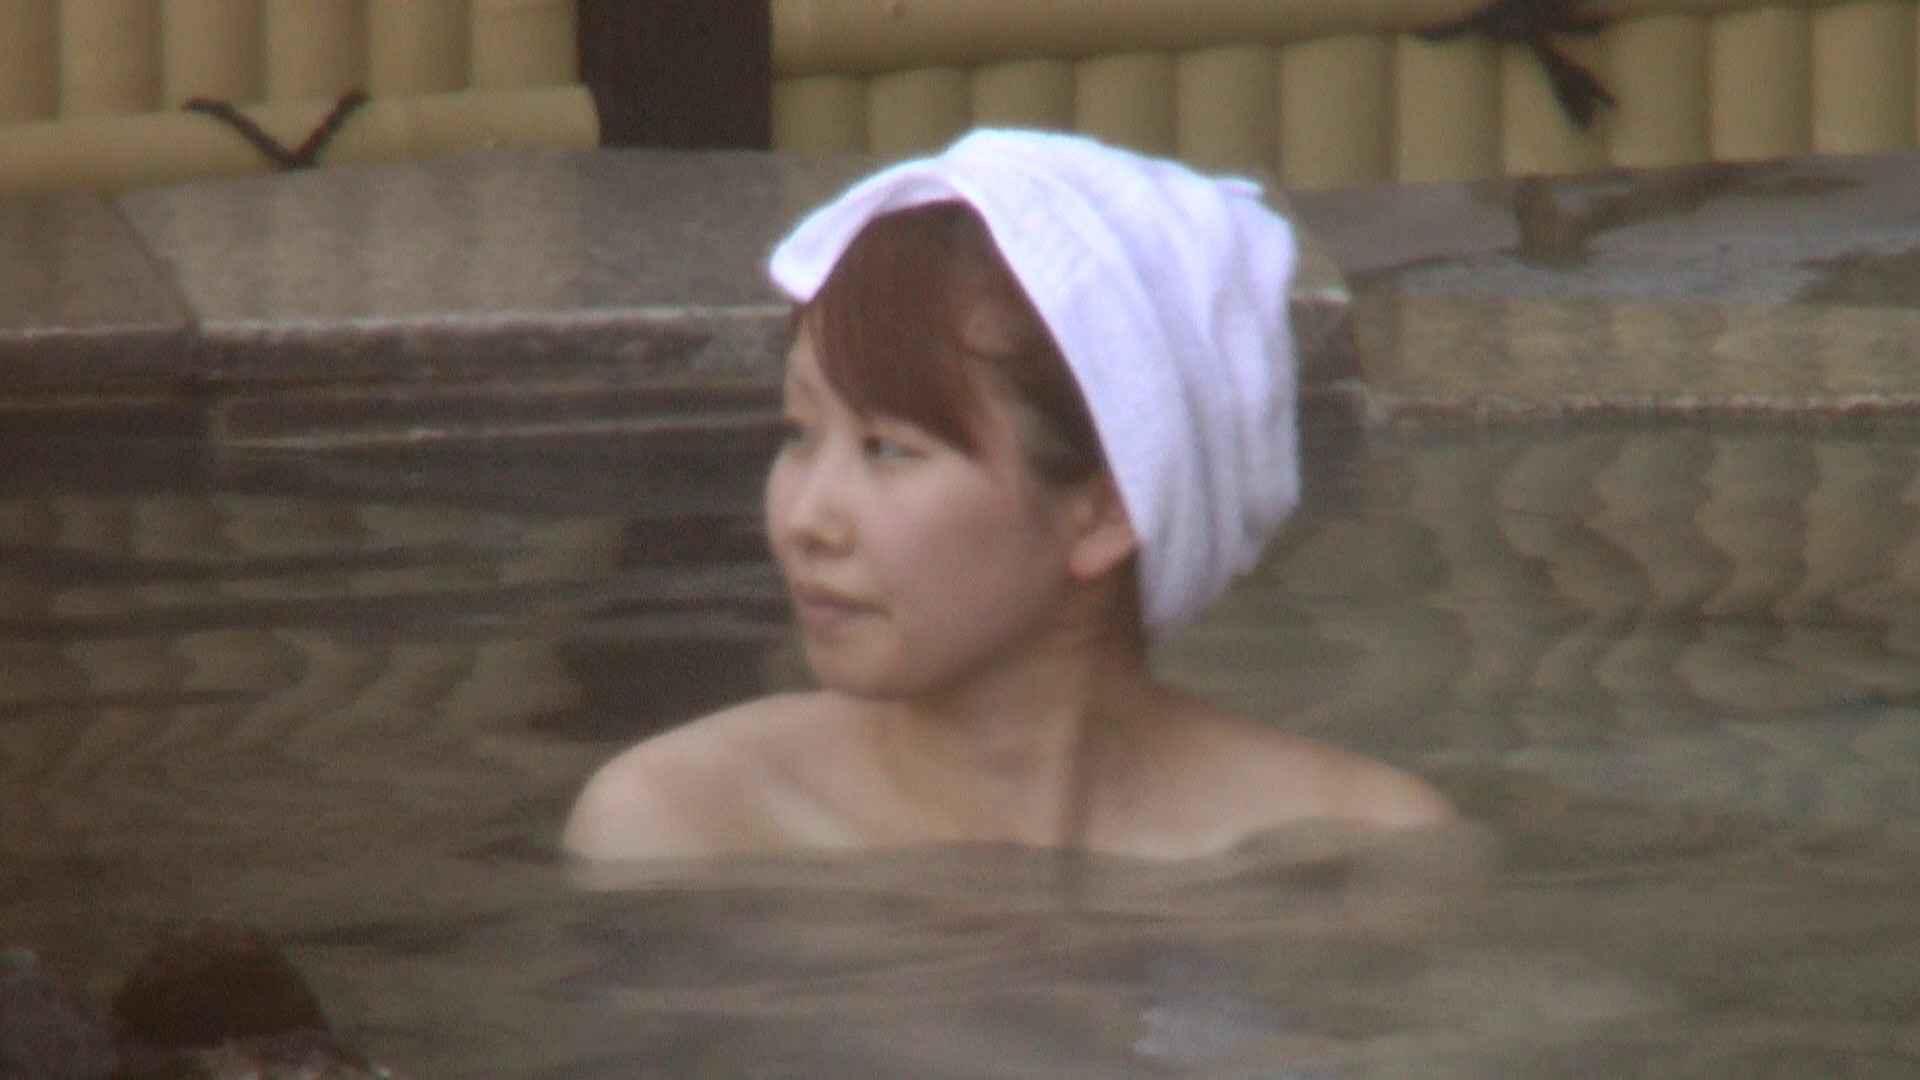 Aquaな露天風呂Vol.210 露天風呂 ワレメ動画紹介 83連発 47